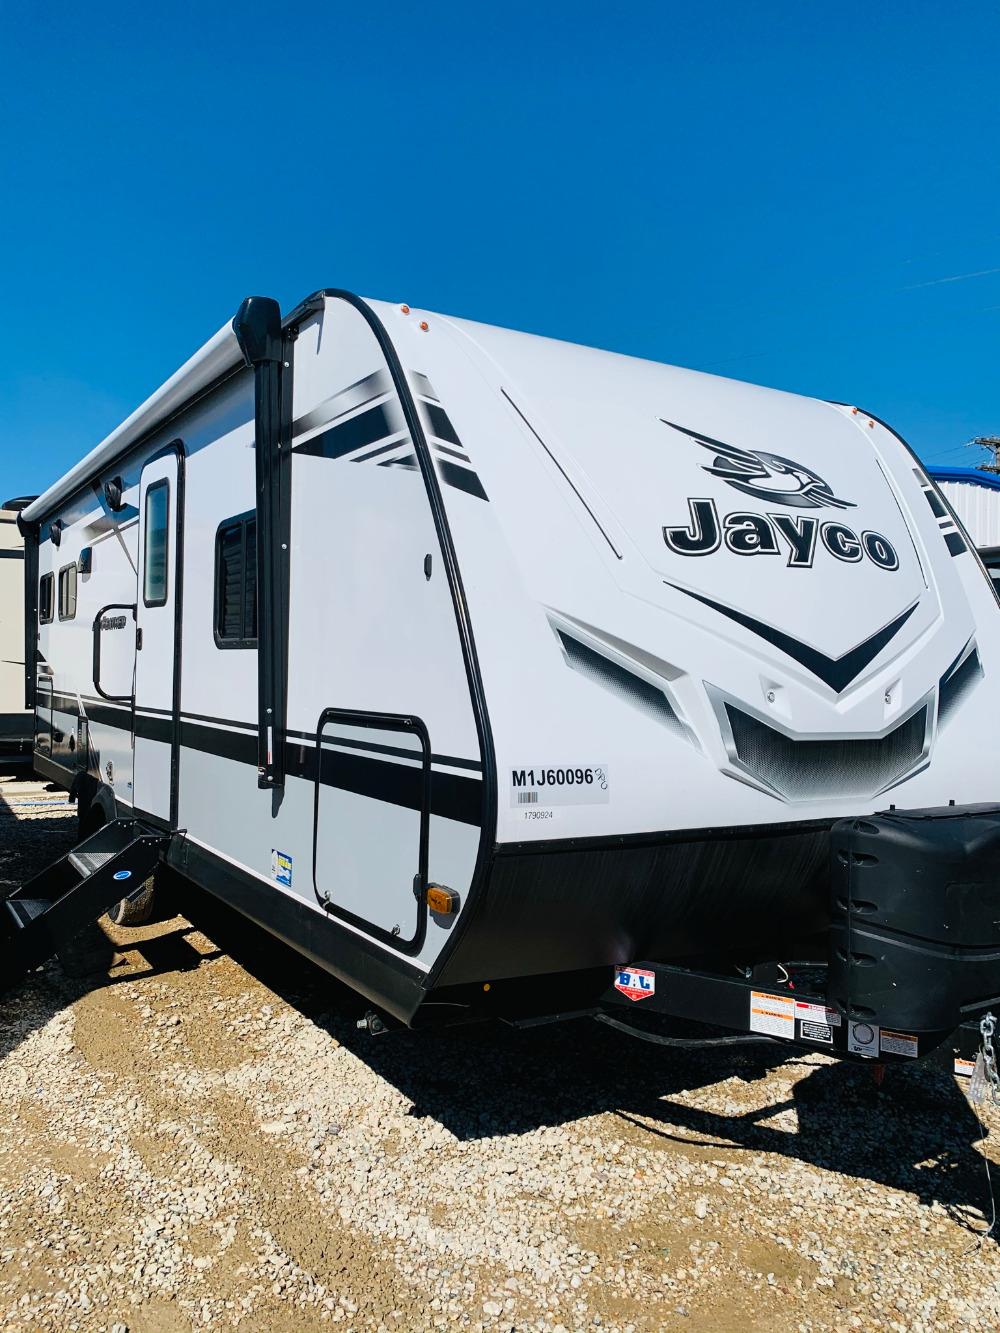 2021 Jayco 24rl